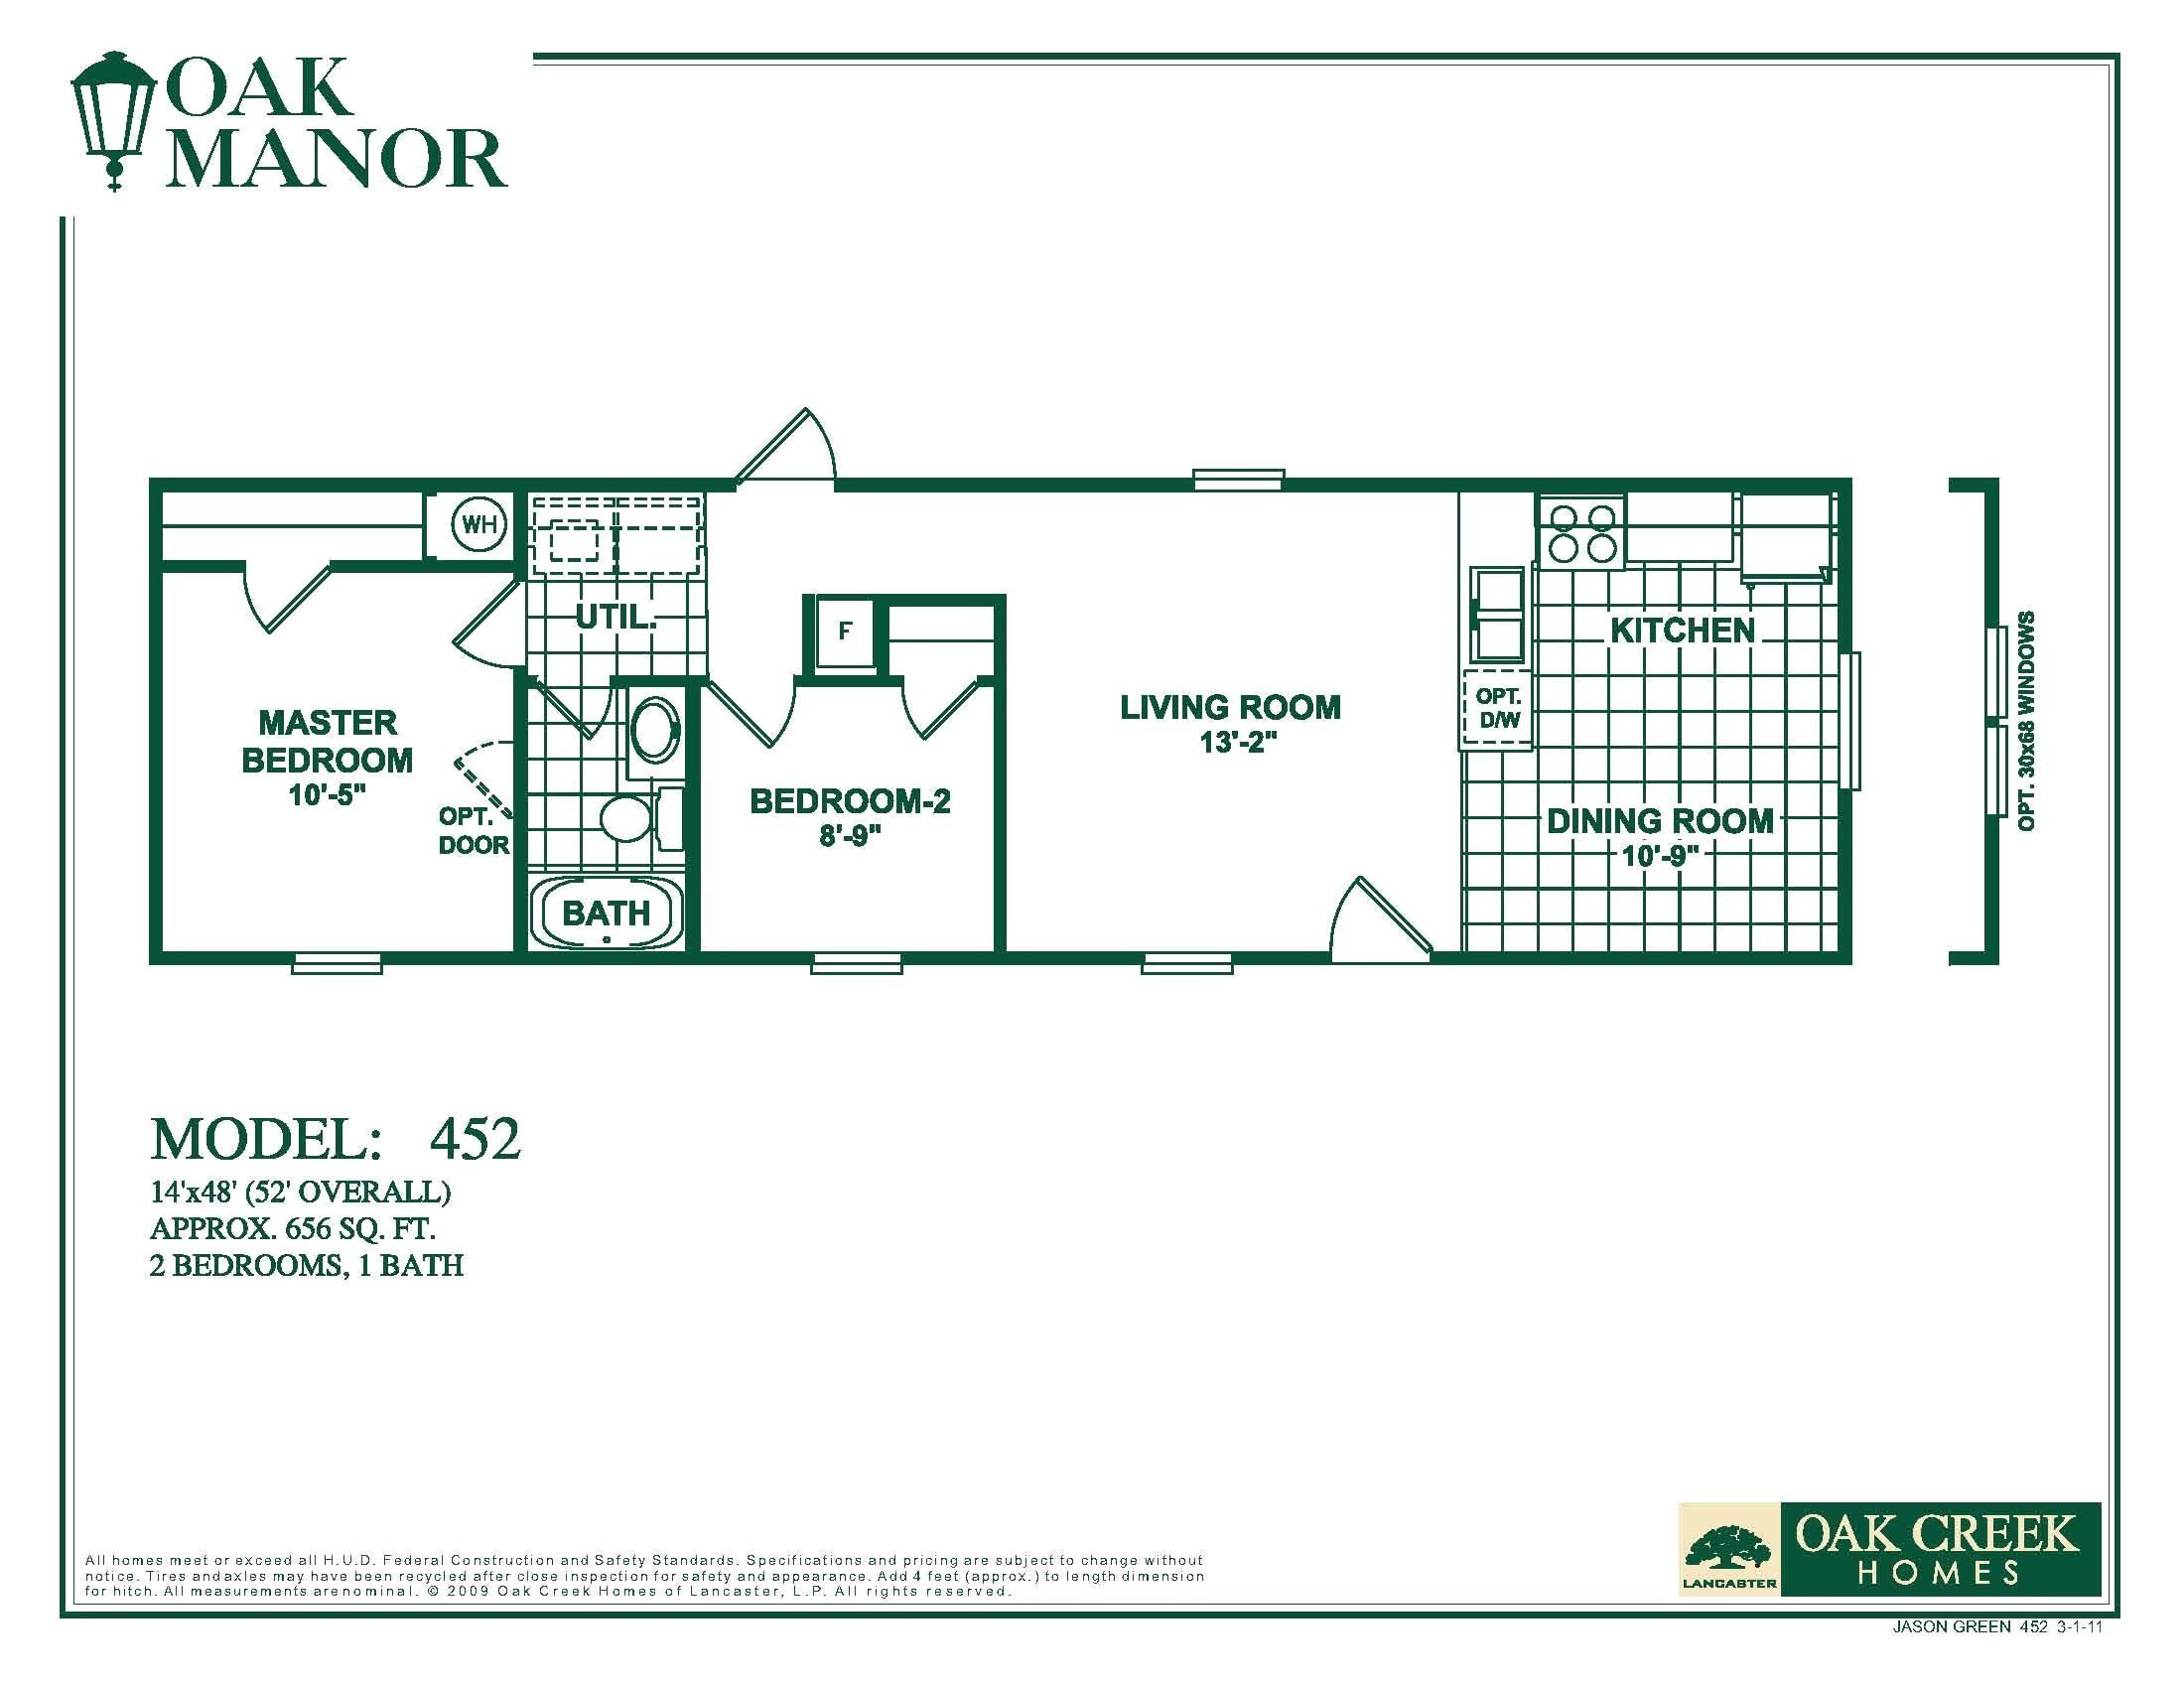 oak creek homes floor plans awesome oak creek homes floor plans fresh adams homes floor plans lovely